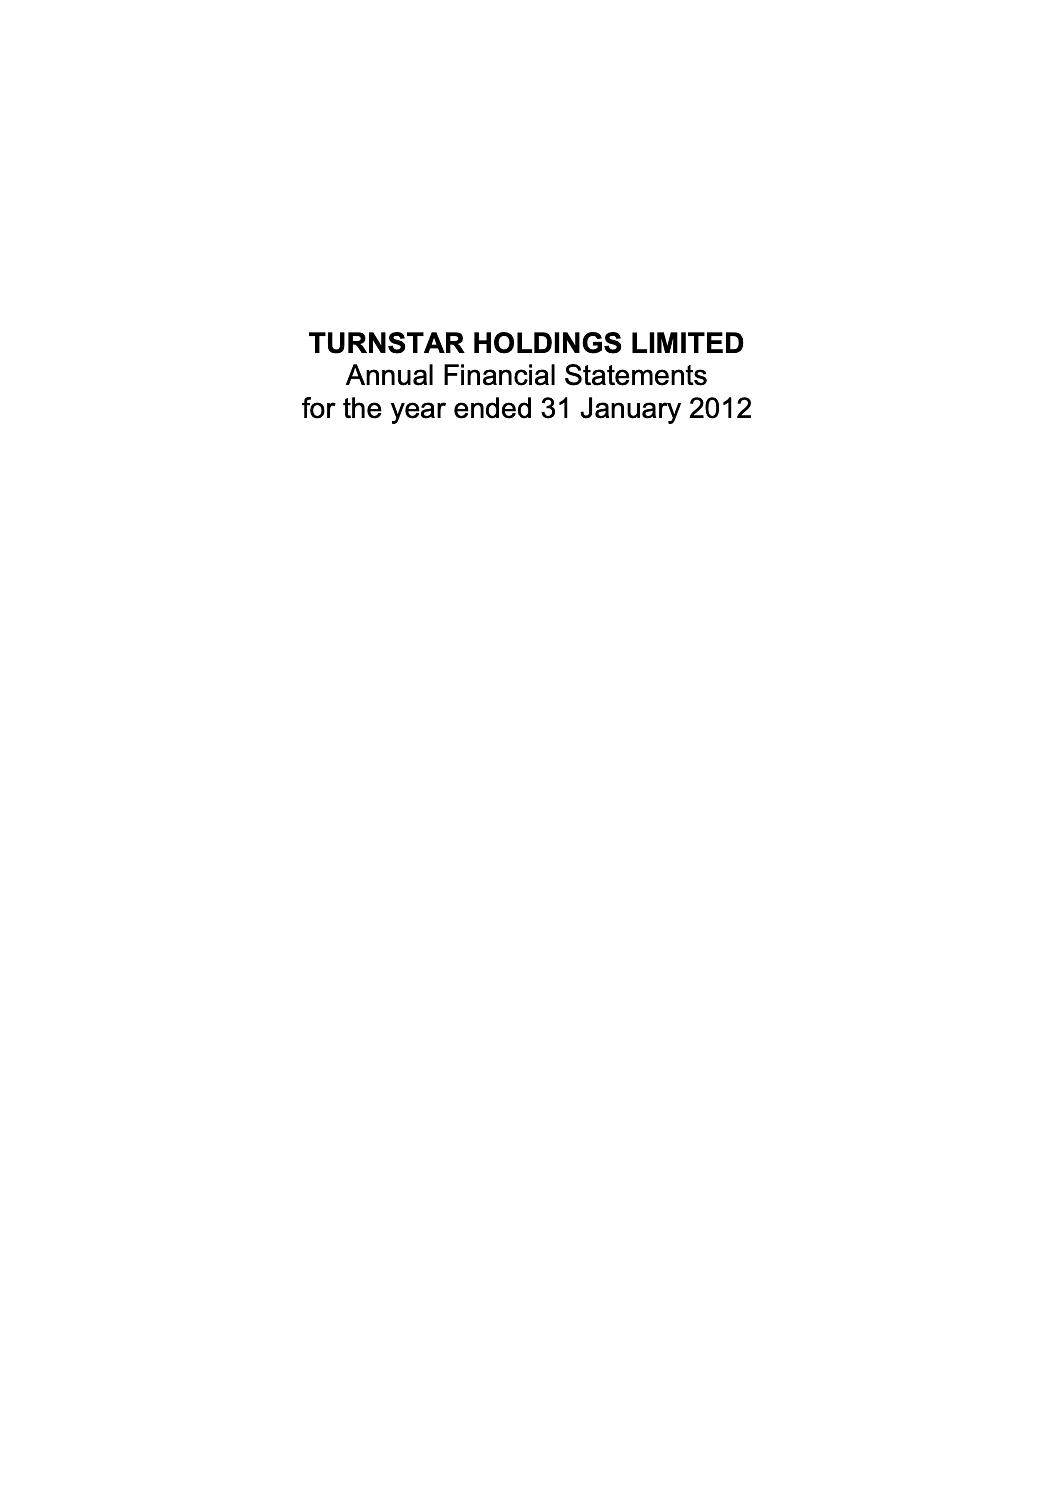 Turnstar Annual Report 2012 cover